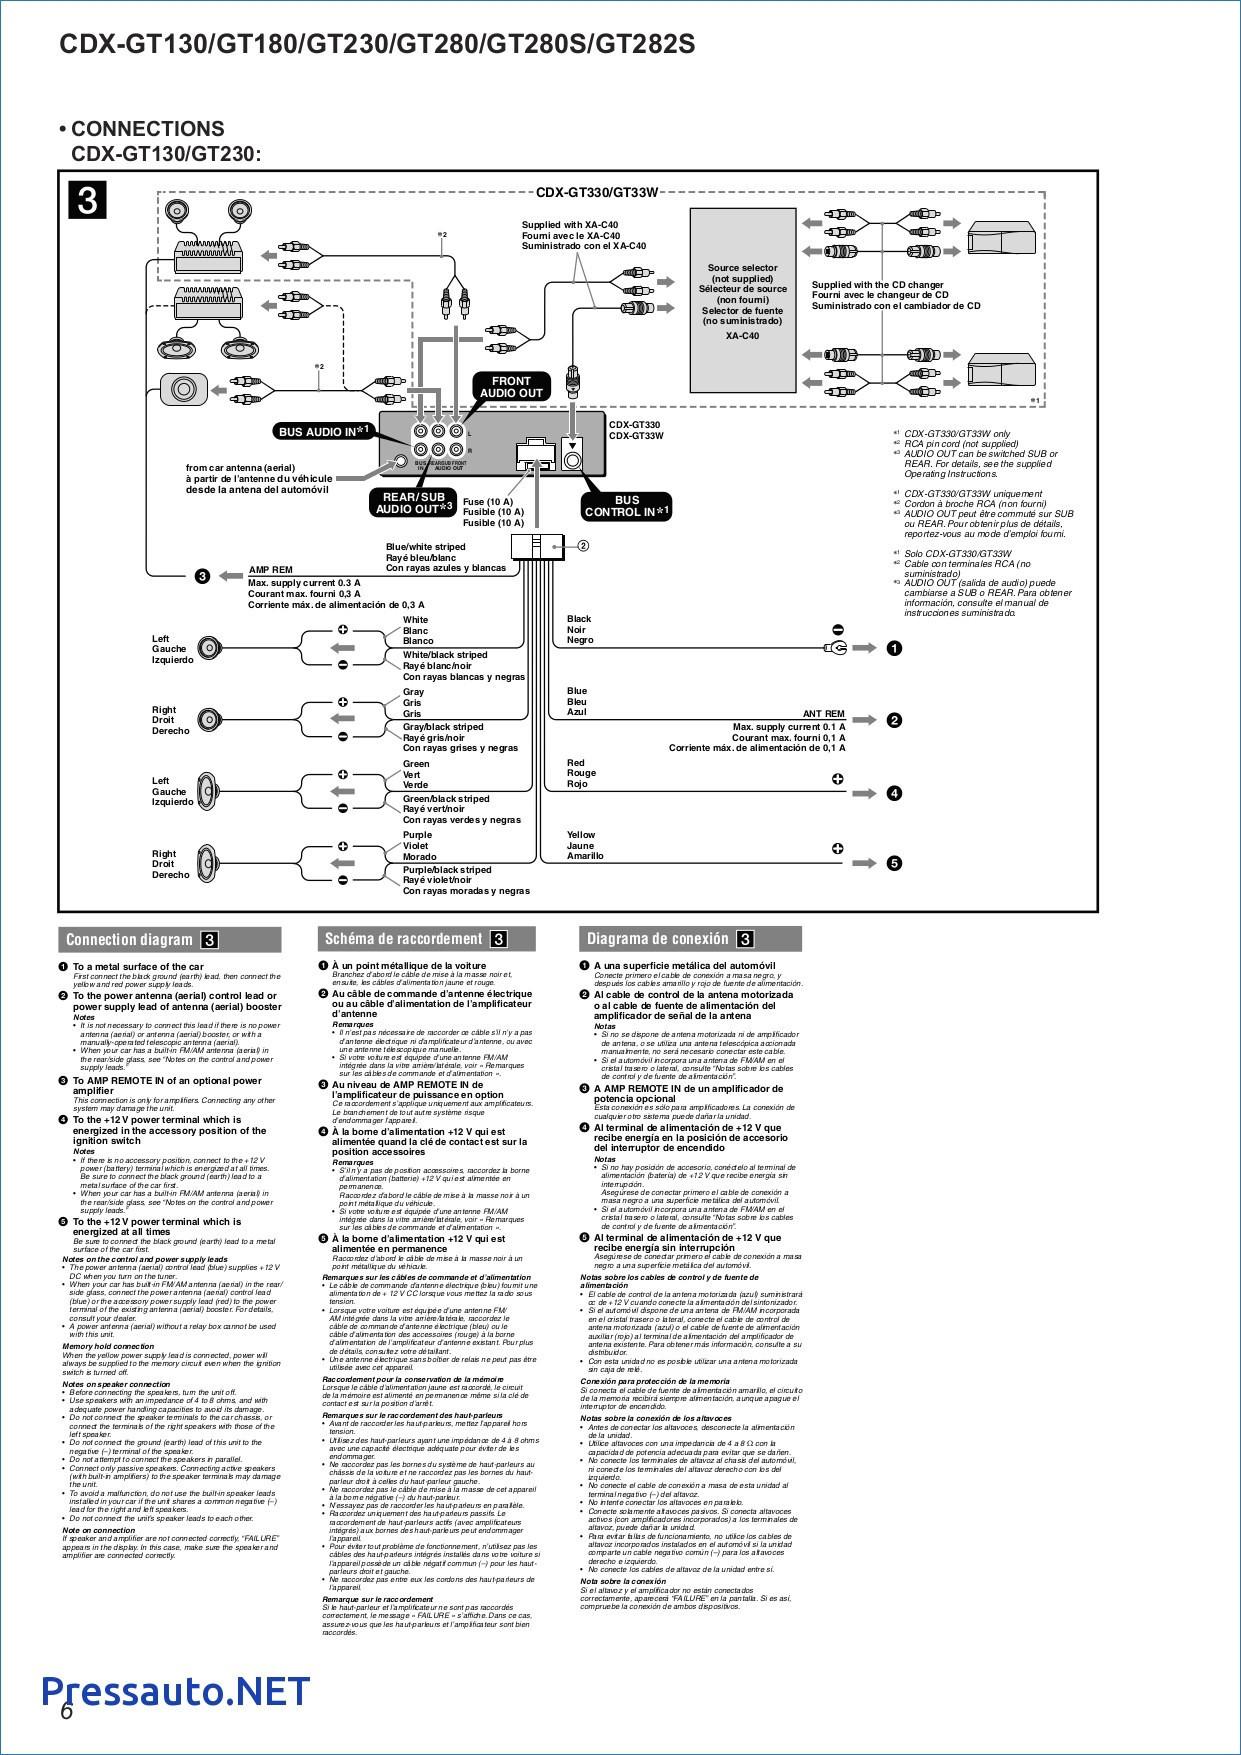 sony cdx ca700x wiring diagram switch diagram u2022 rh wandrlust co